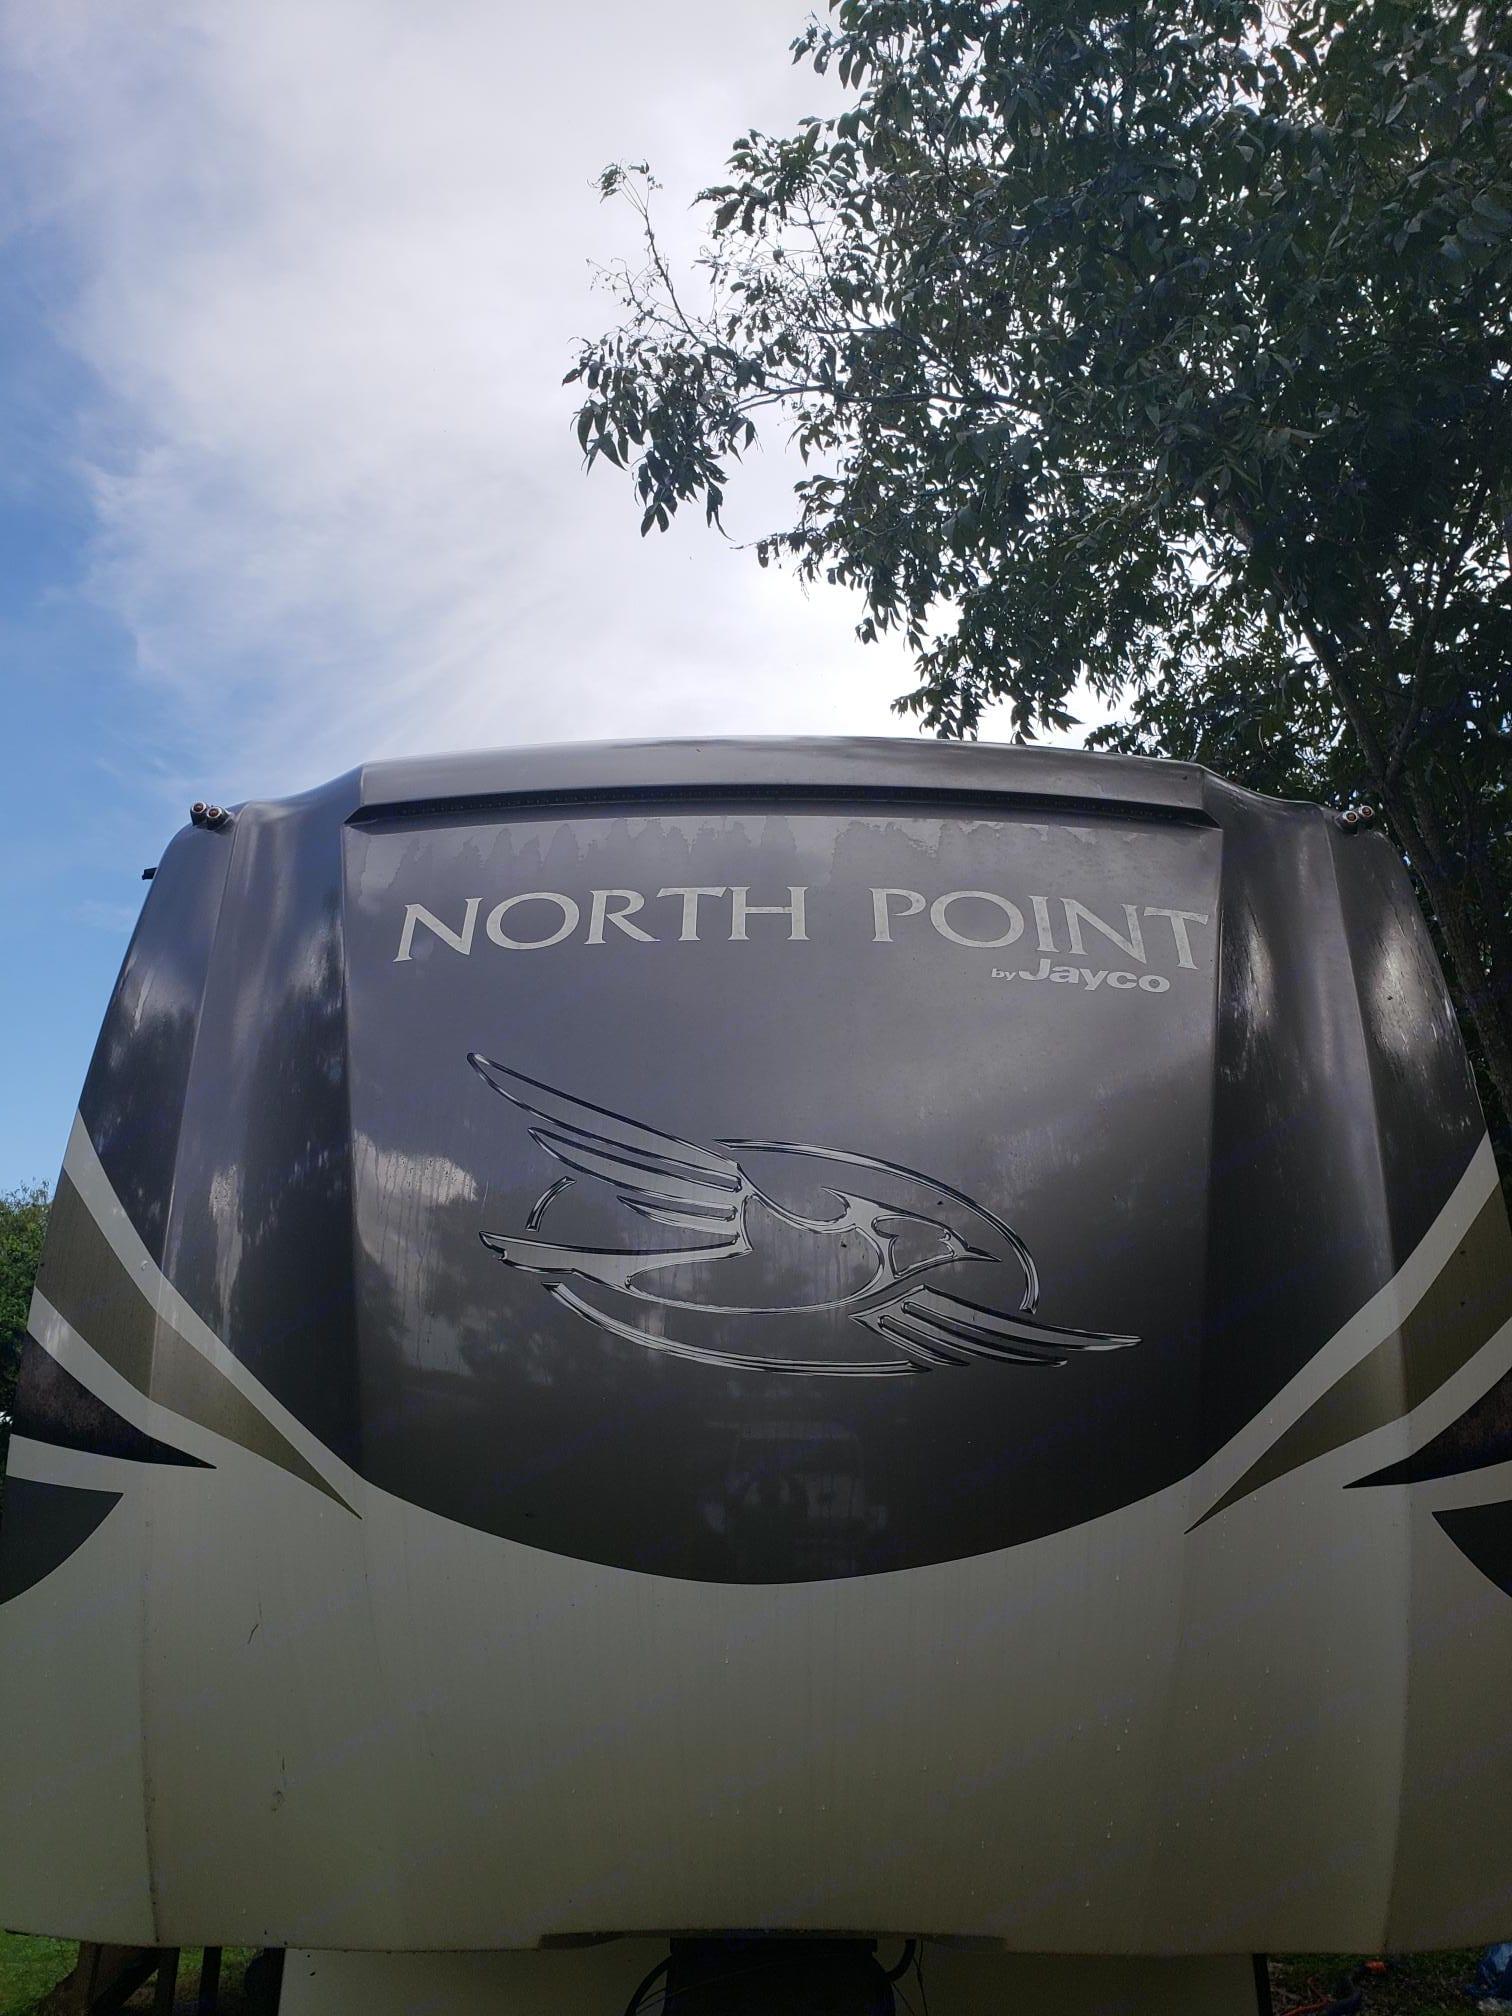 Jayco North Point 2018